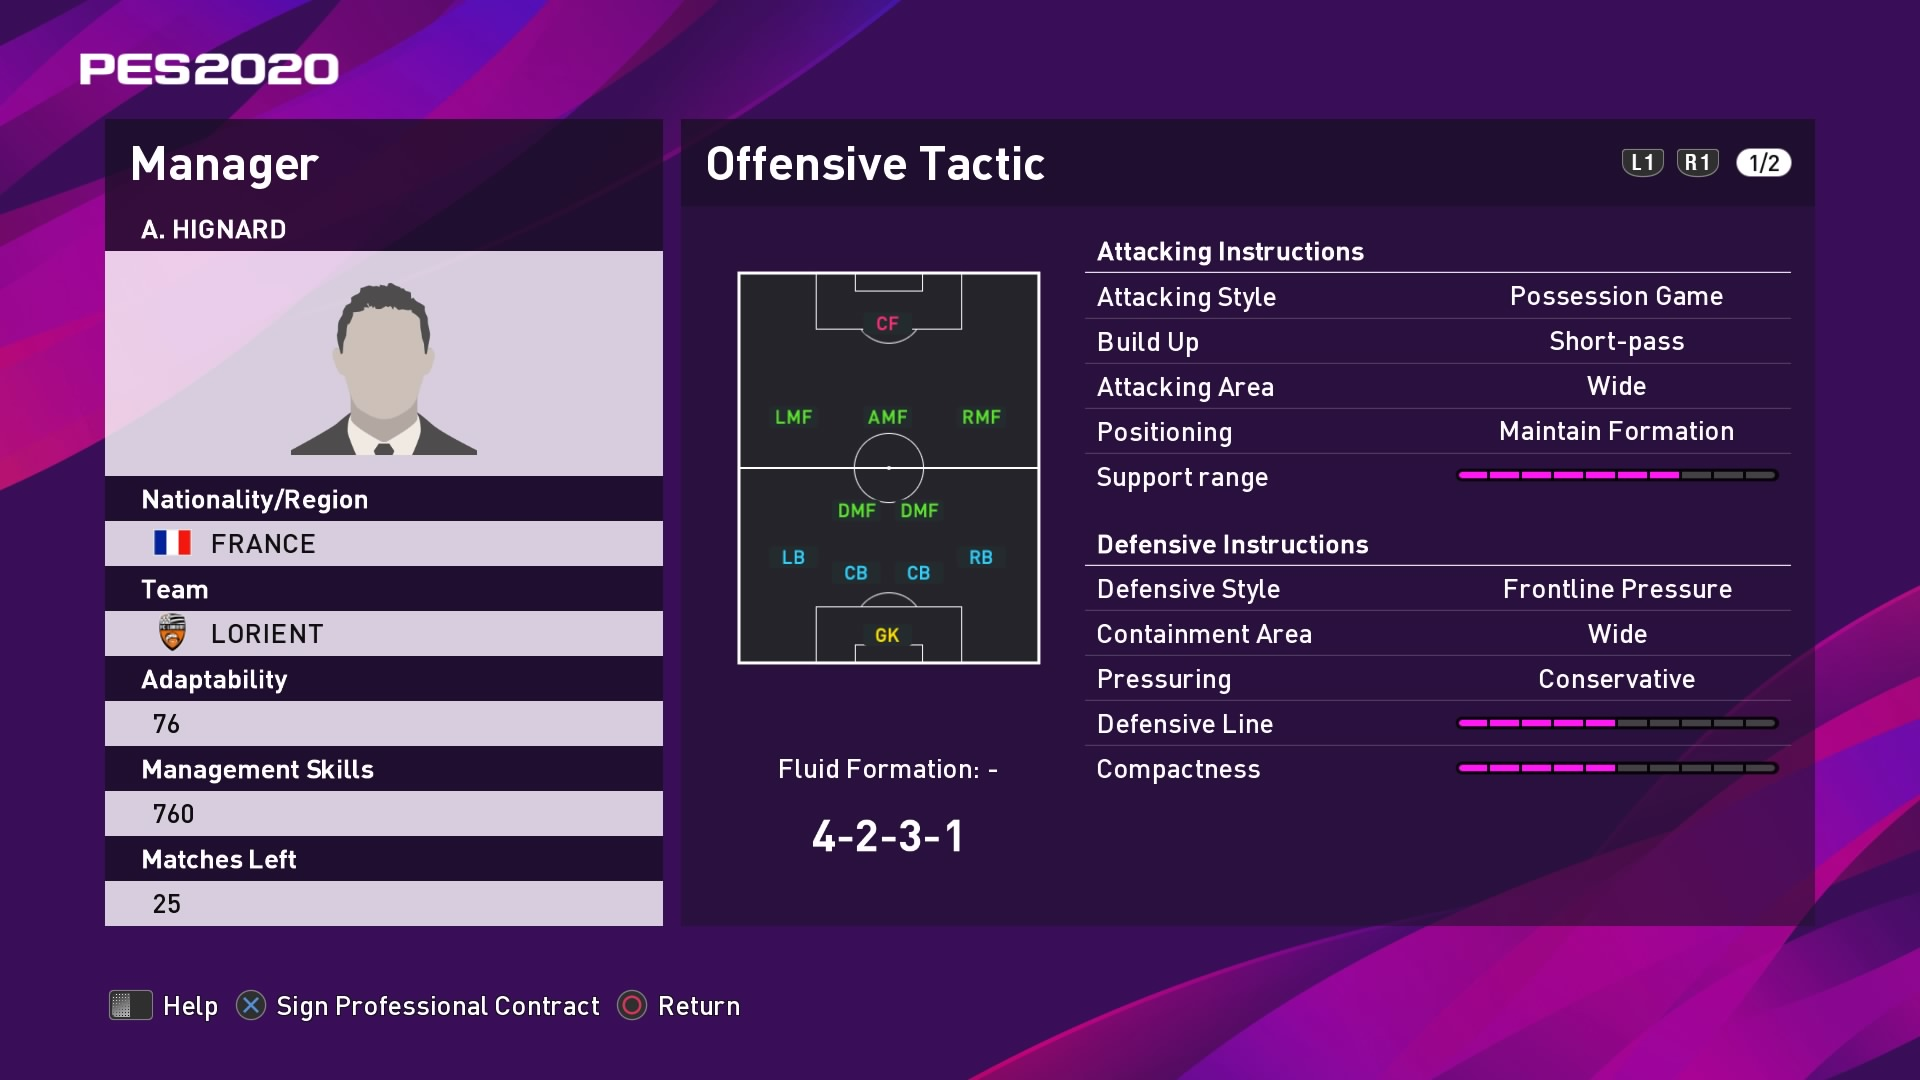 A. Hignard (Christophe Pélissier) Offensive Tactic in PES 2020 myClub